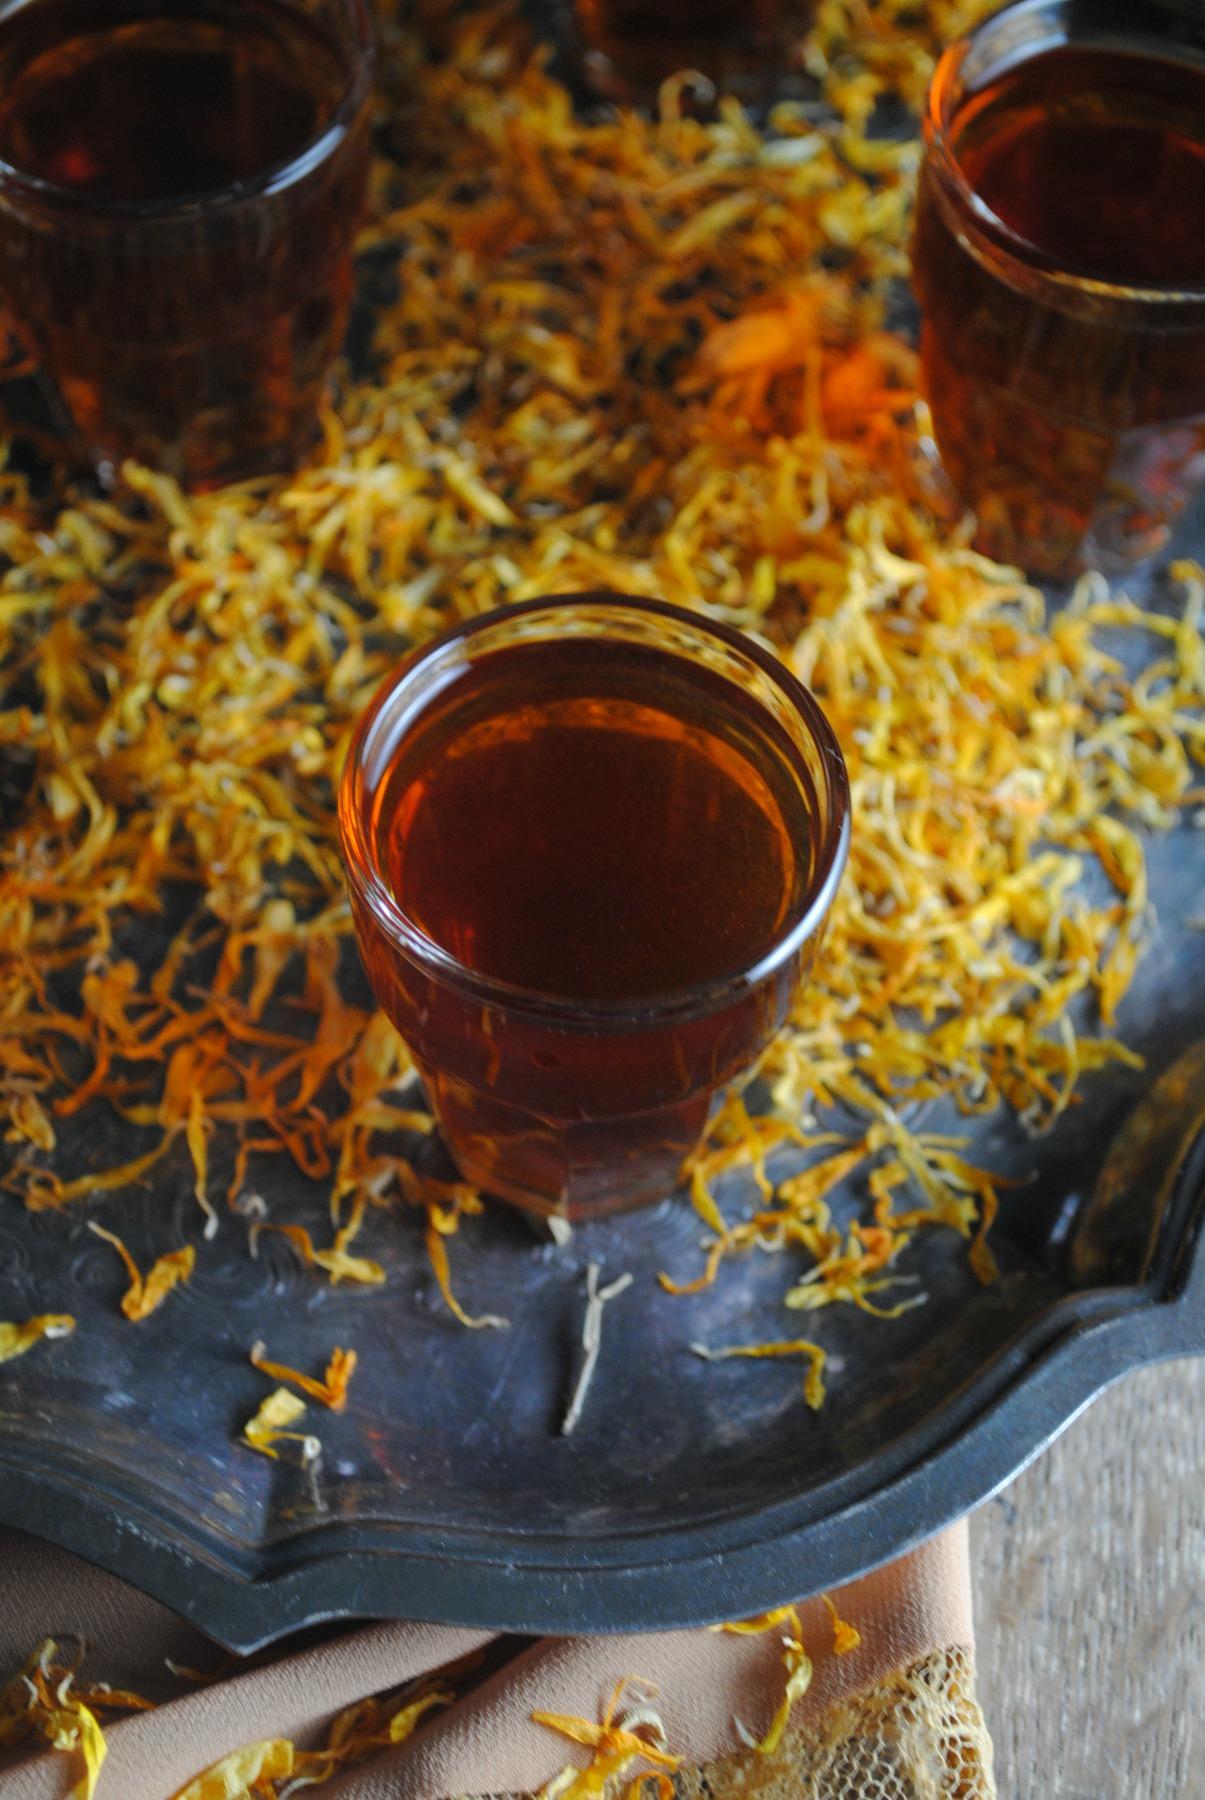 infused-tequila-marigolds-diadelosmuertos-VianneyRodriguez